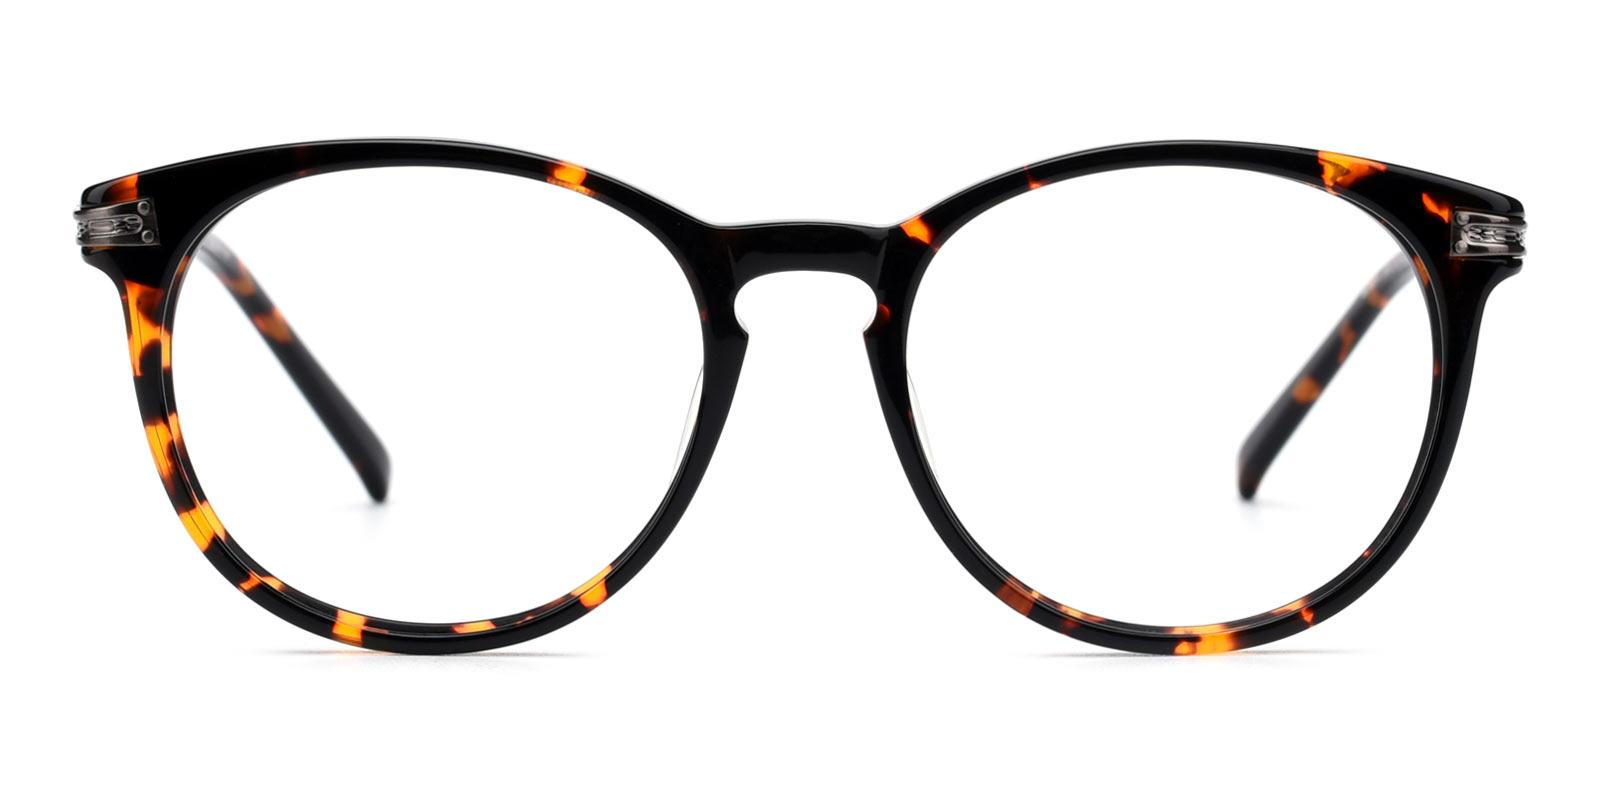 Condiments-Tortoise-Round-TR-Eyeglasses-detail